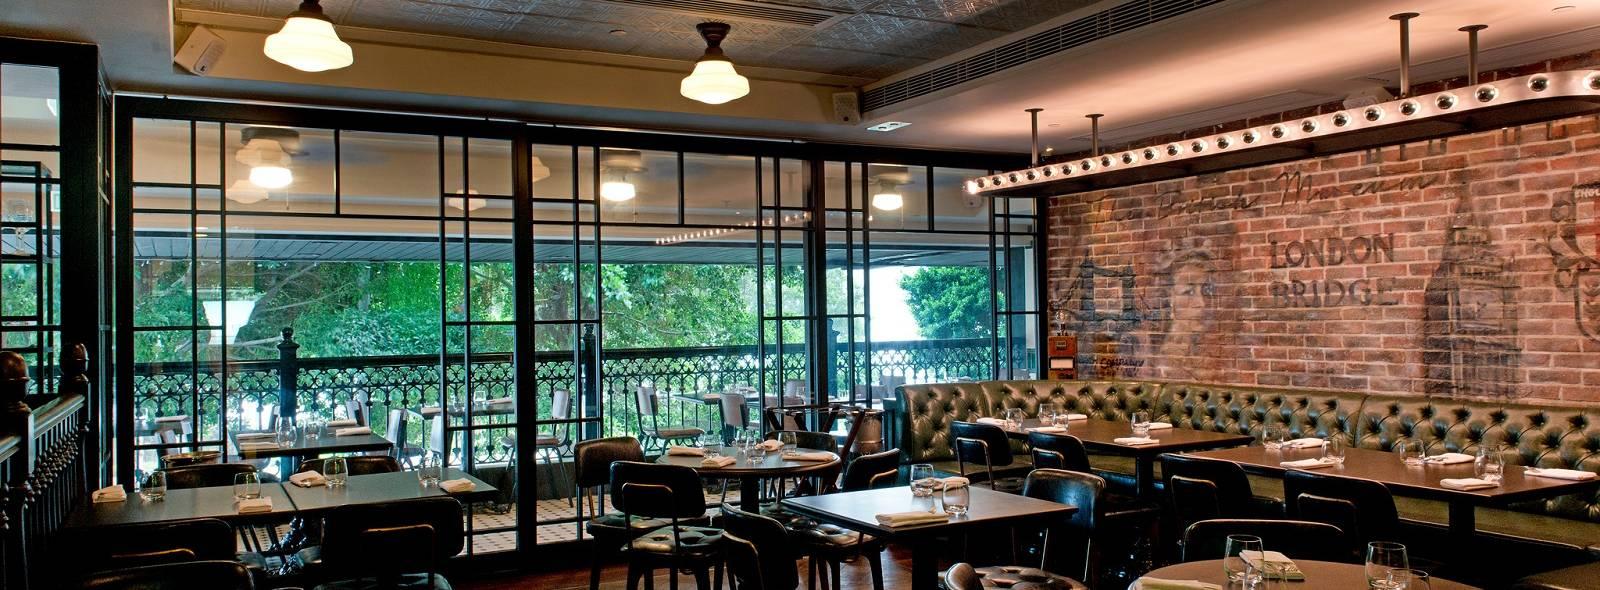 London House Hong Kong Gordon Ramsay Restaurants